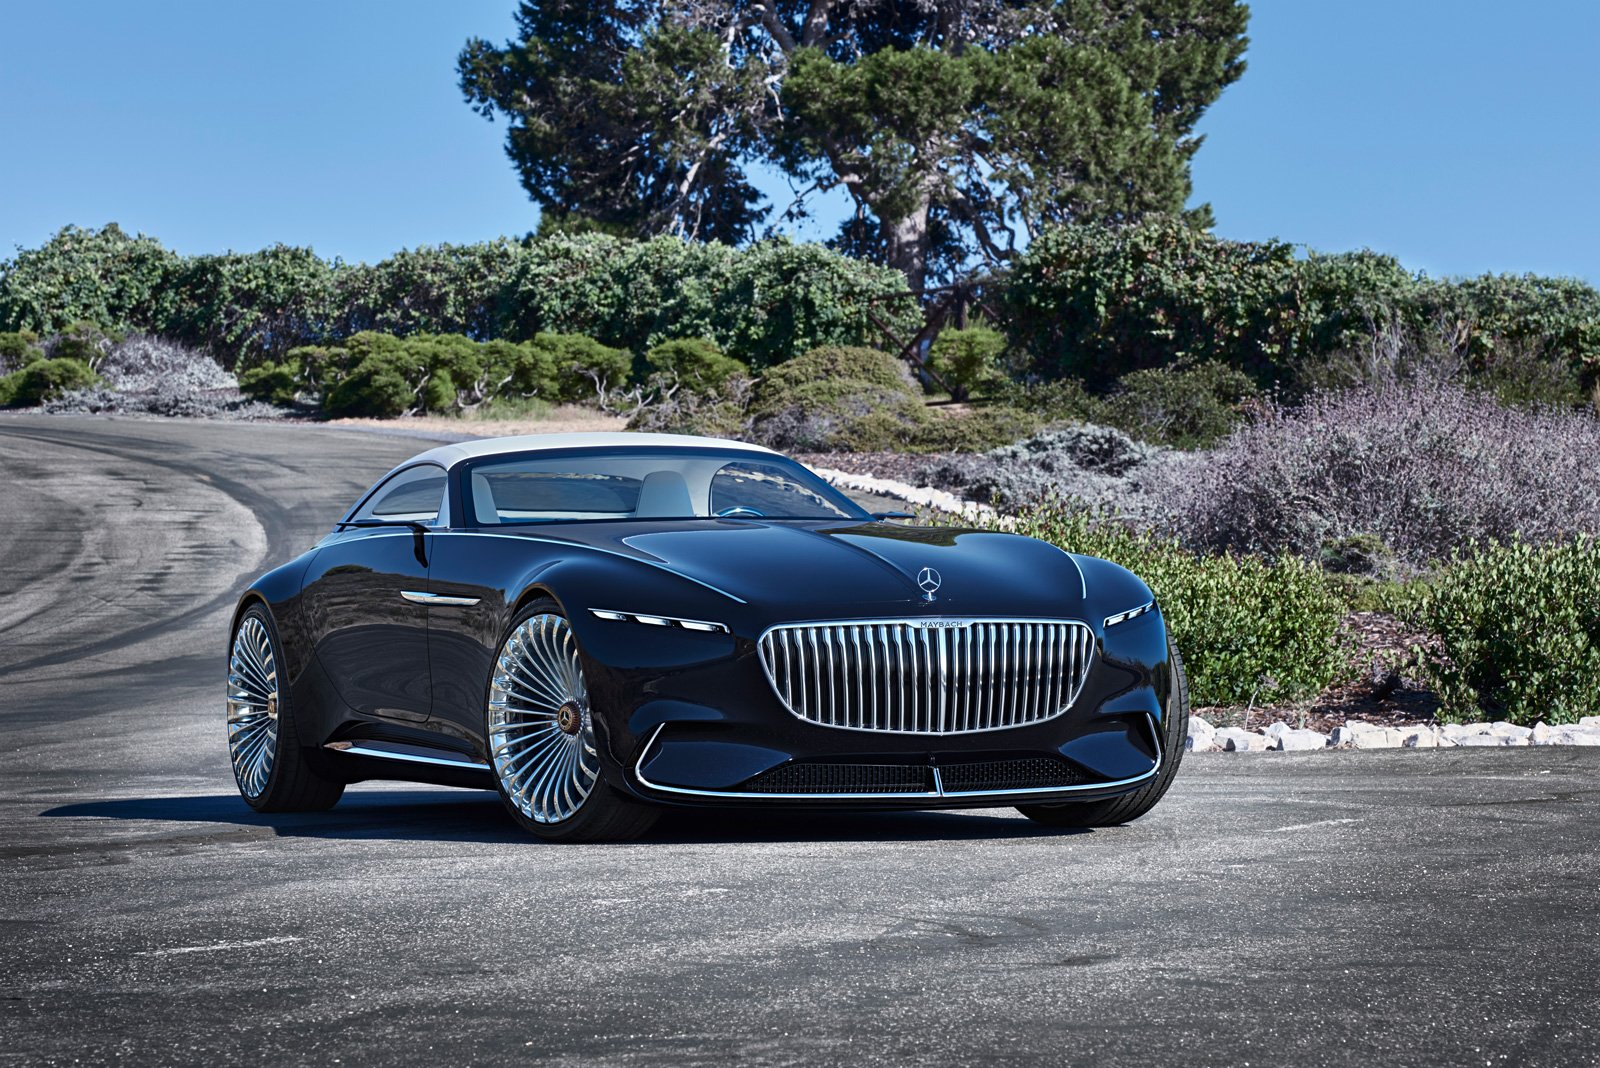 Konceptbilen Vision Mercedes-Maybach 6 Cabriolet.